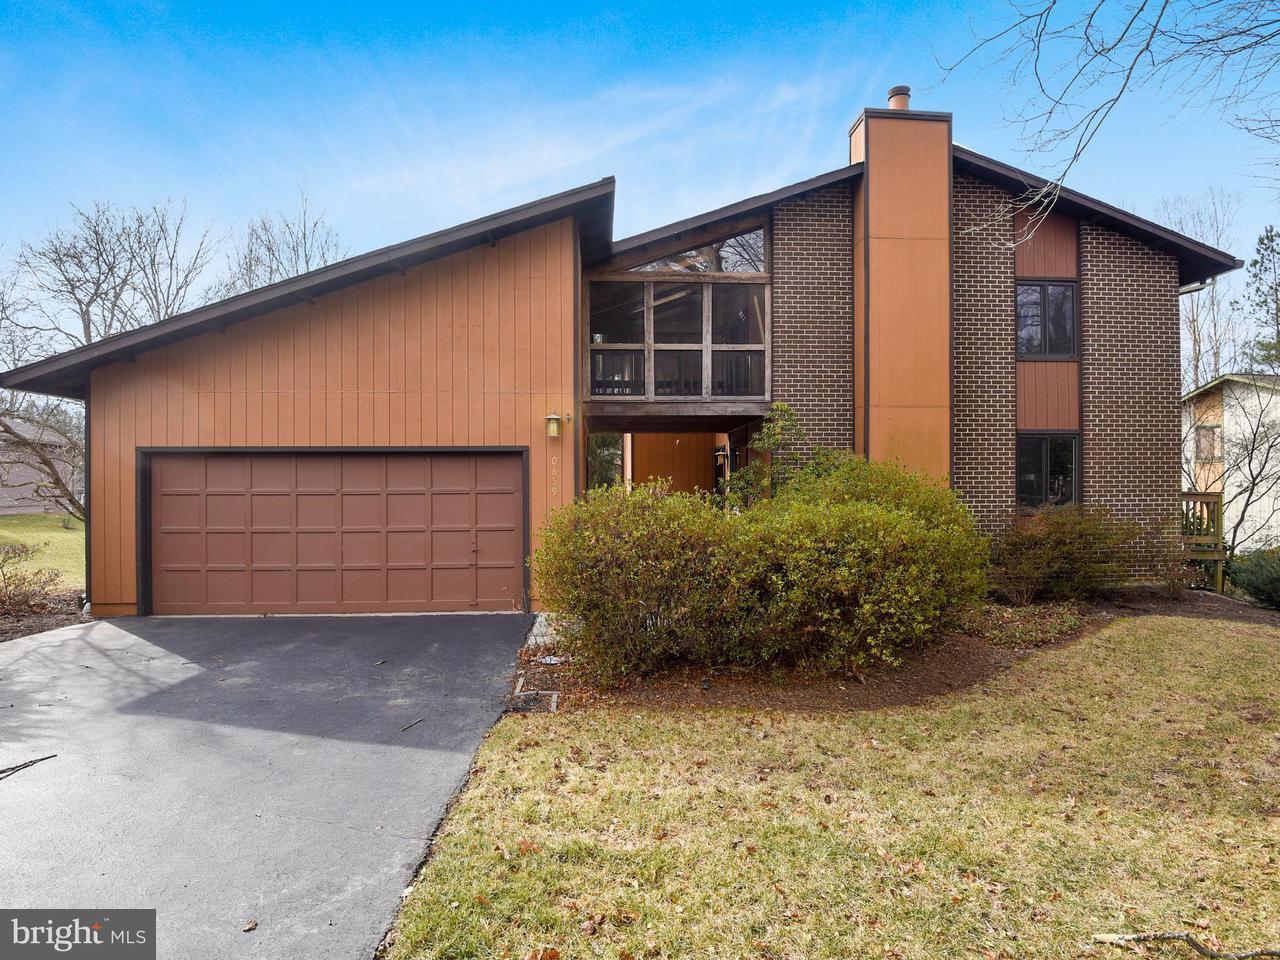 Single Family Home for Sale at 10859 Parcel Court 10859 Parcel Court Oakton, Virginia 22124 United States